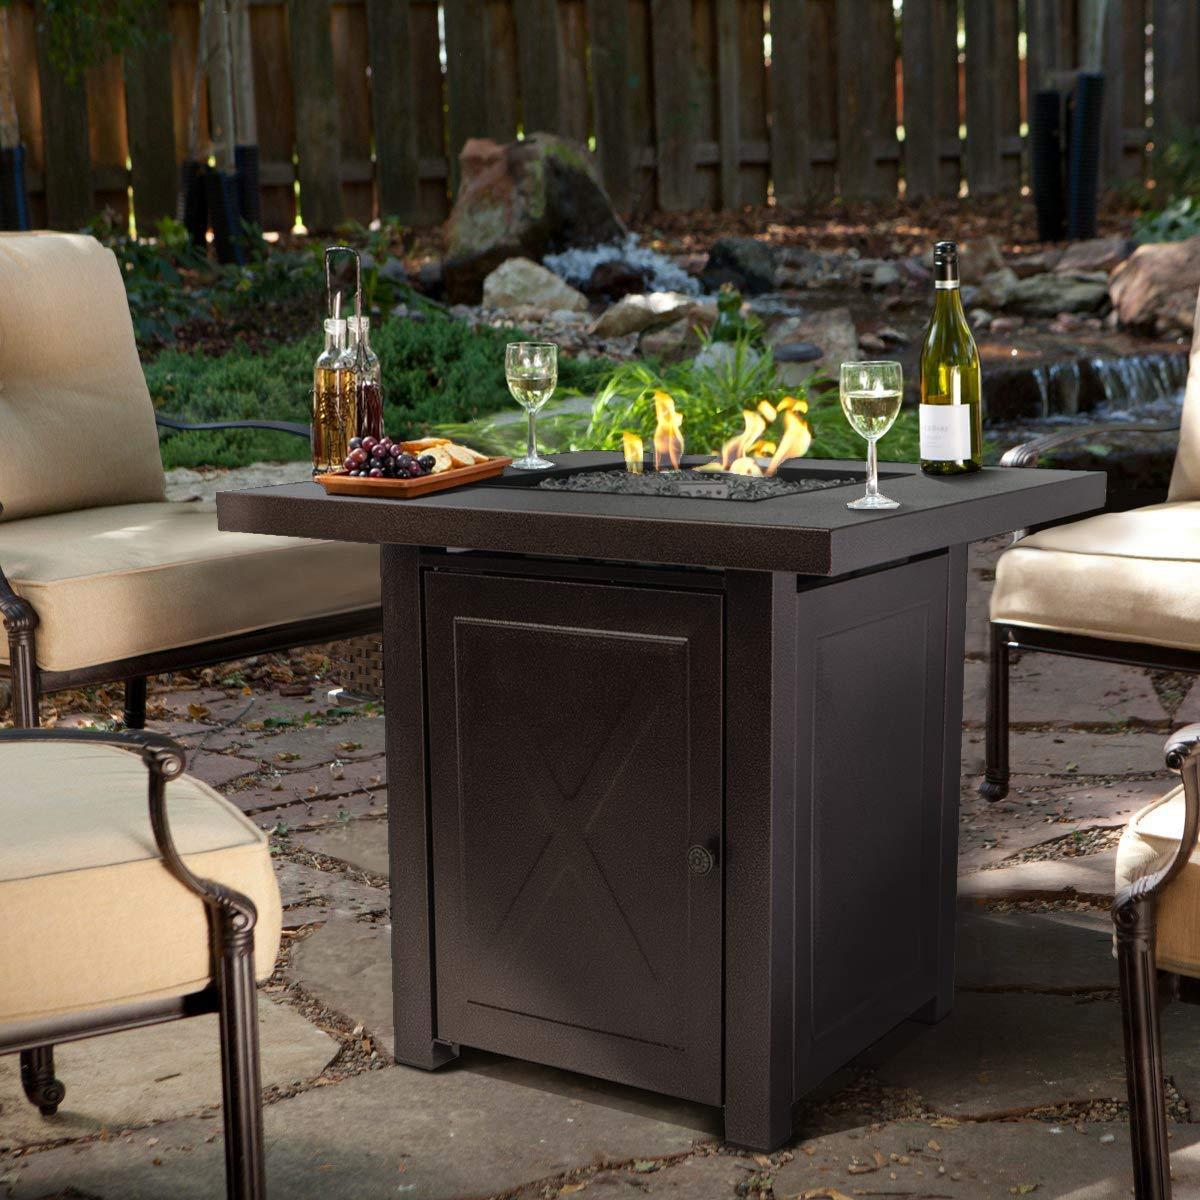 Amazon com barton fire pit table fire glass fireplace outdoor garden patio heater firepit with lid 46 000btu garden outdoor